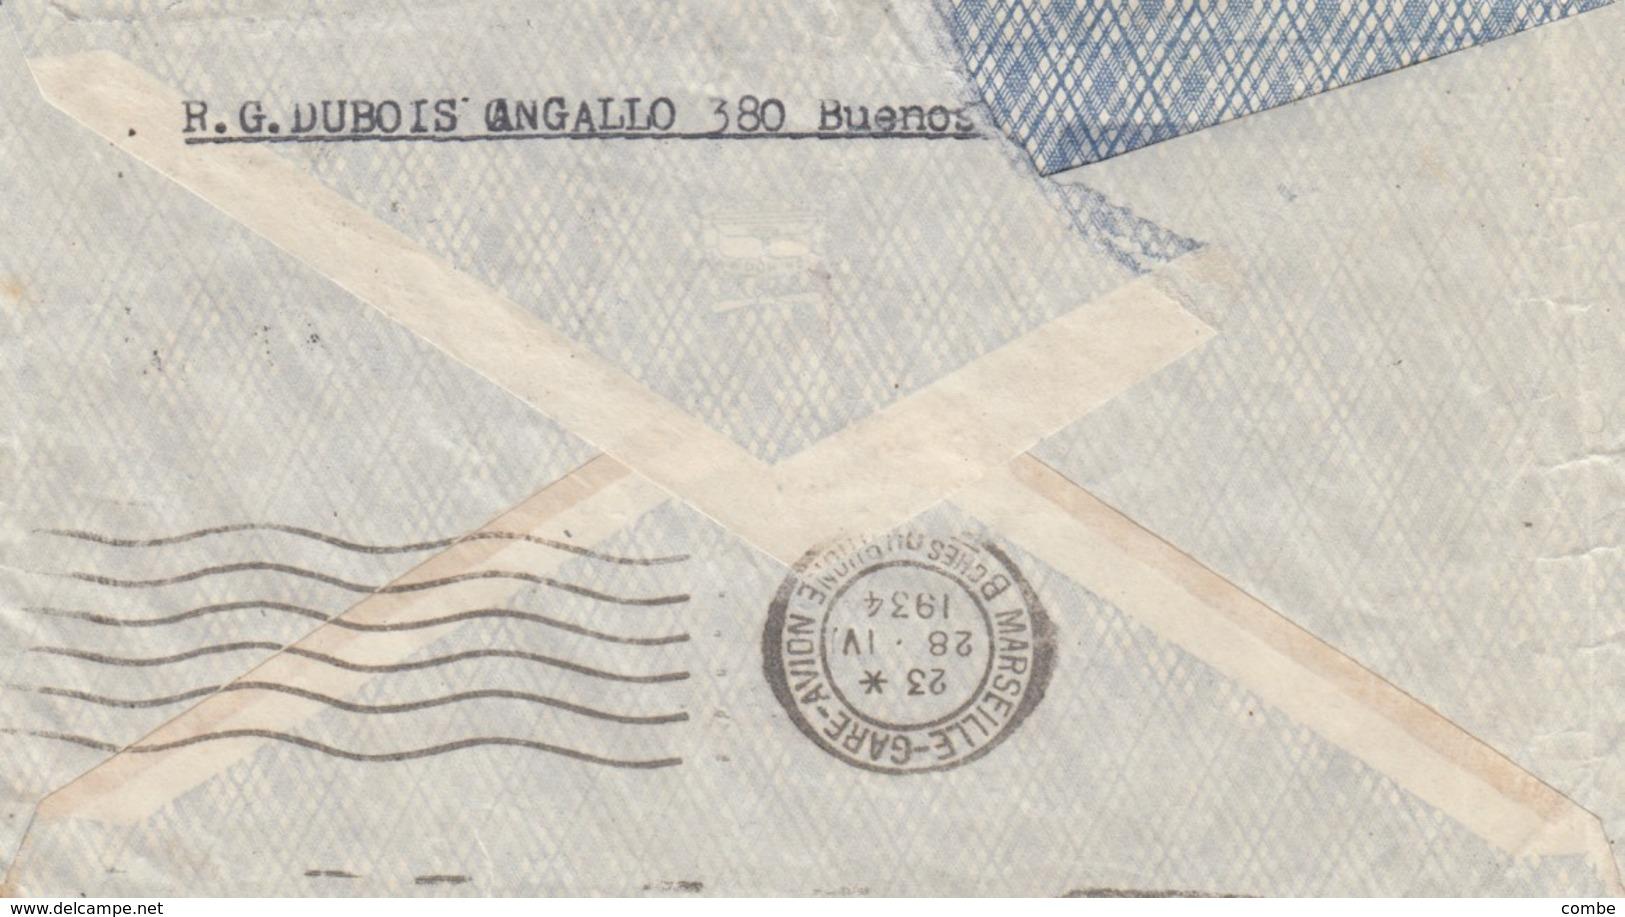 LETTRE. COVER. ARGENTINA. VIA AEREA. COMPAGNIE GENERALE AEROPOSTALE. 1934. BUENOS AIRES TO LYON FRANCE - Briefmarken